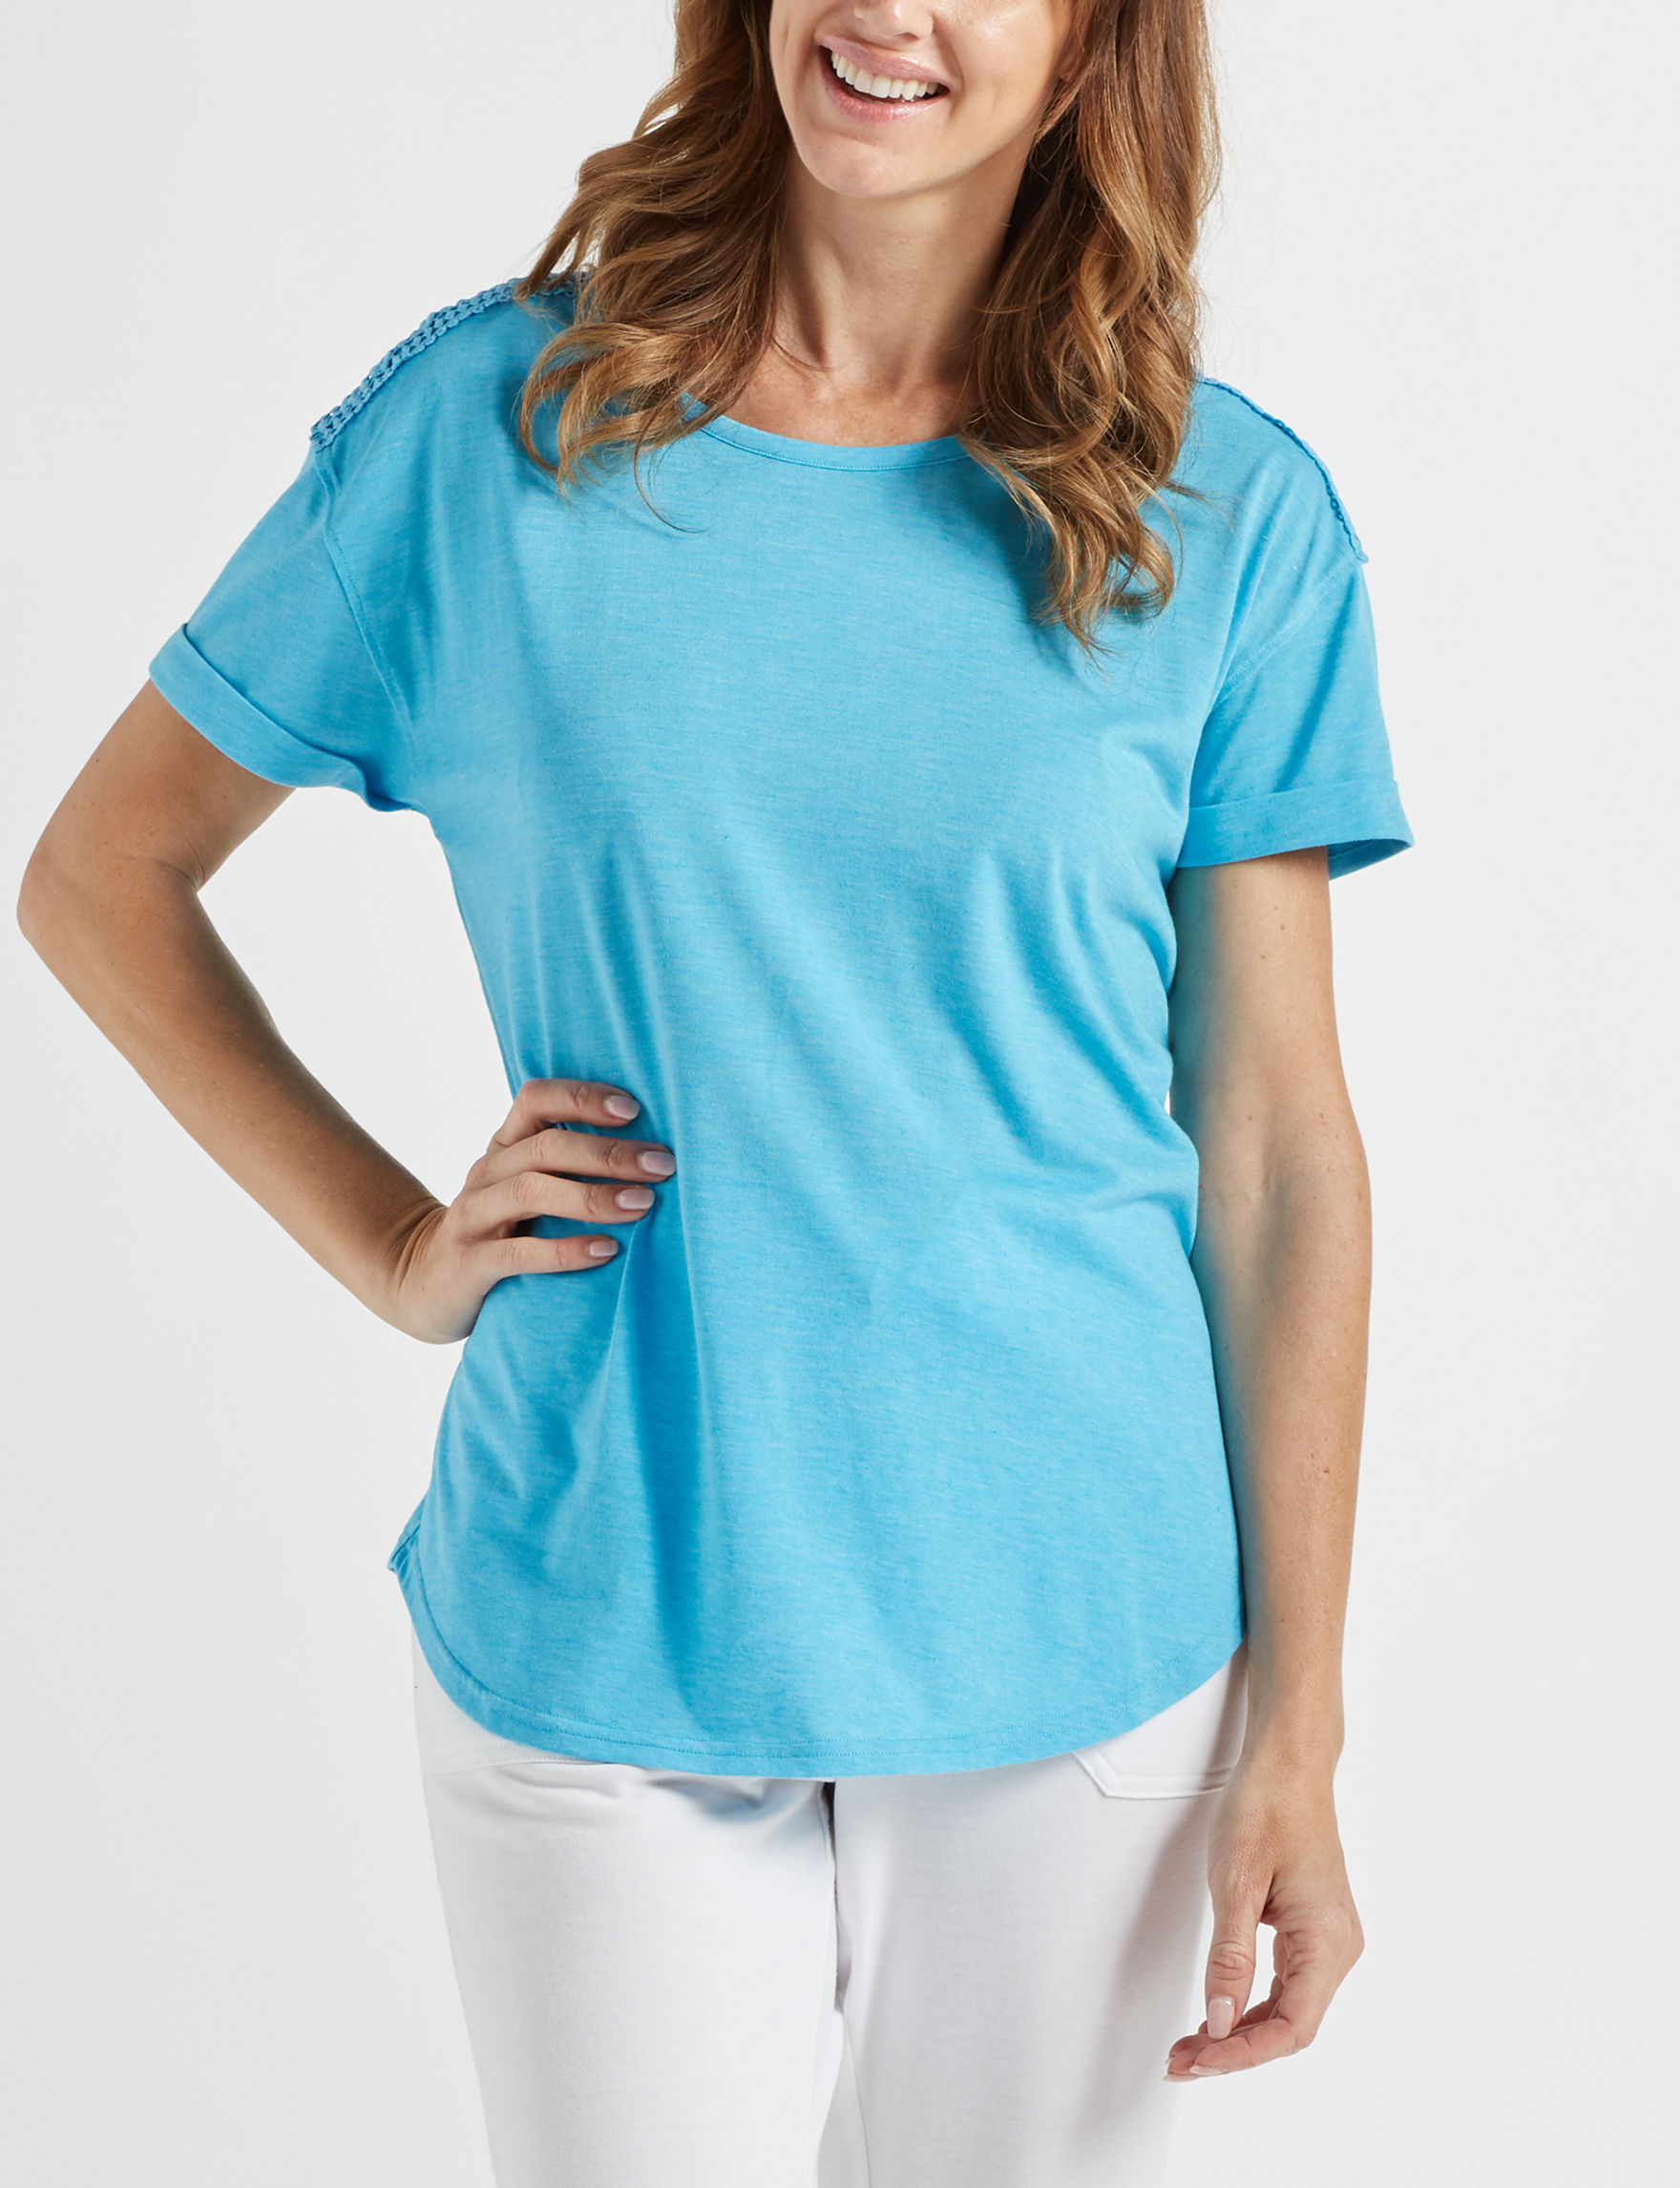 Onyx Blue Shirts & Blouses